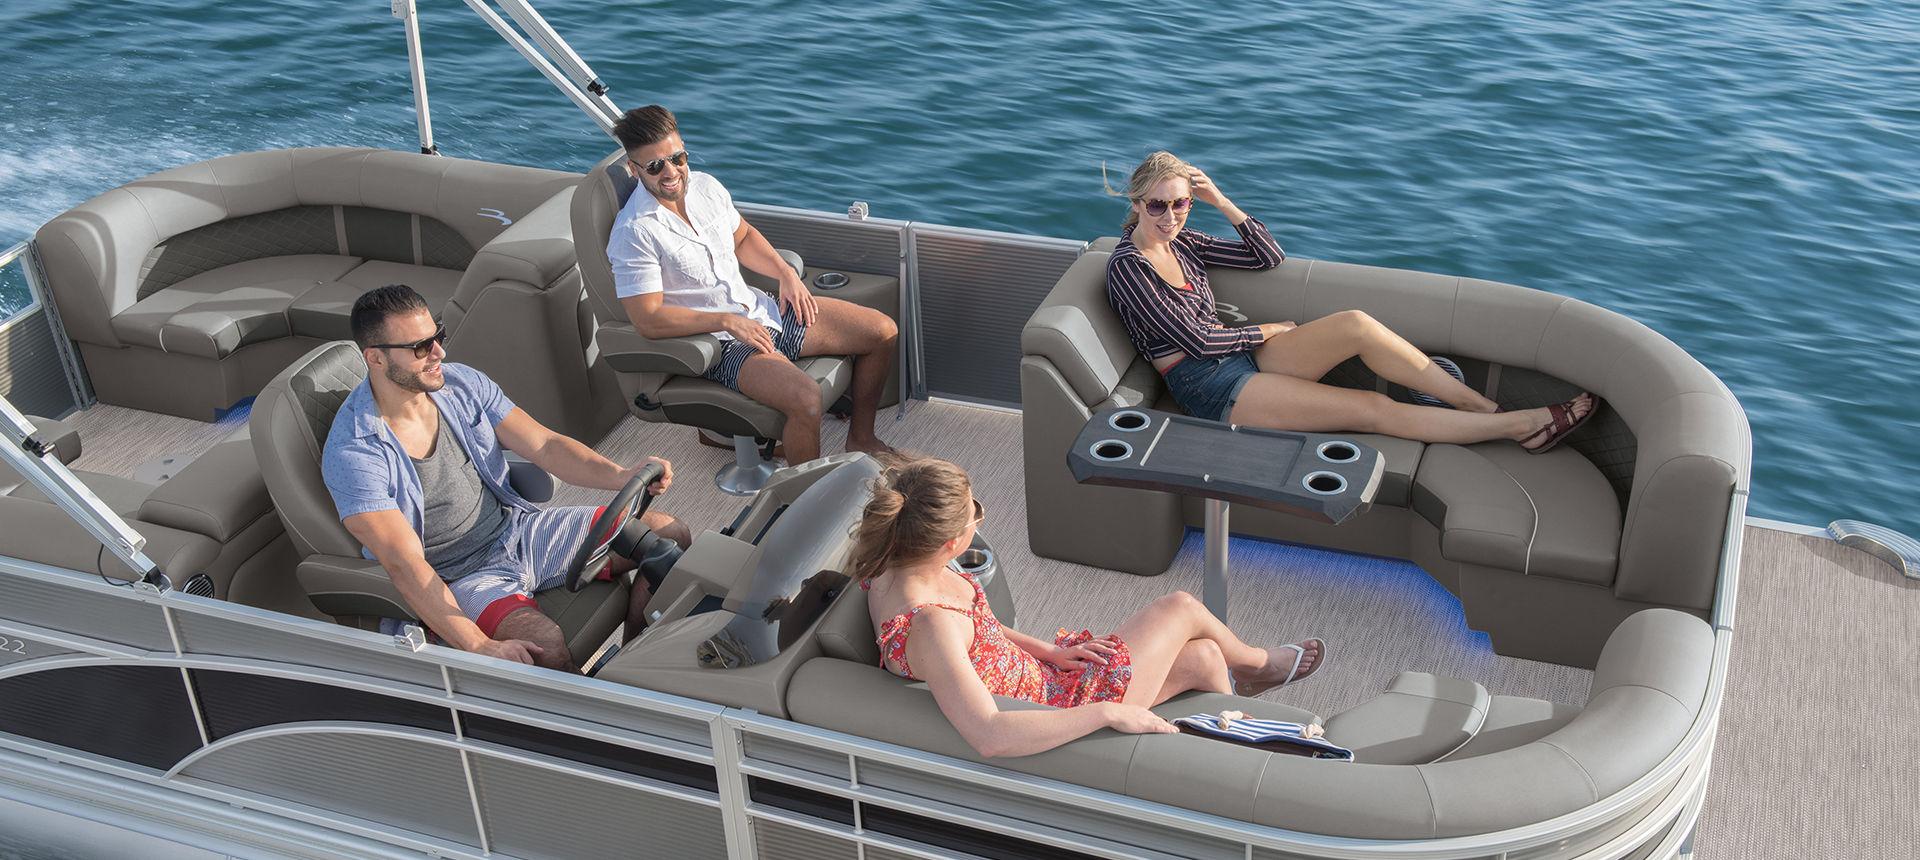 Pic of people on pontoon boat